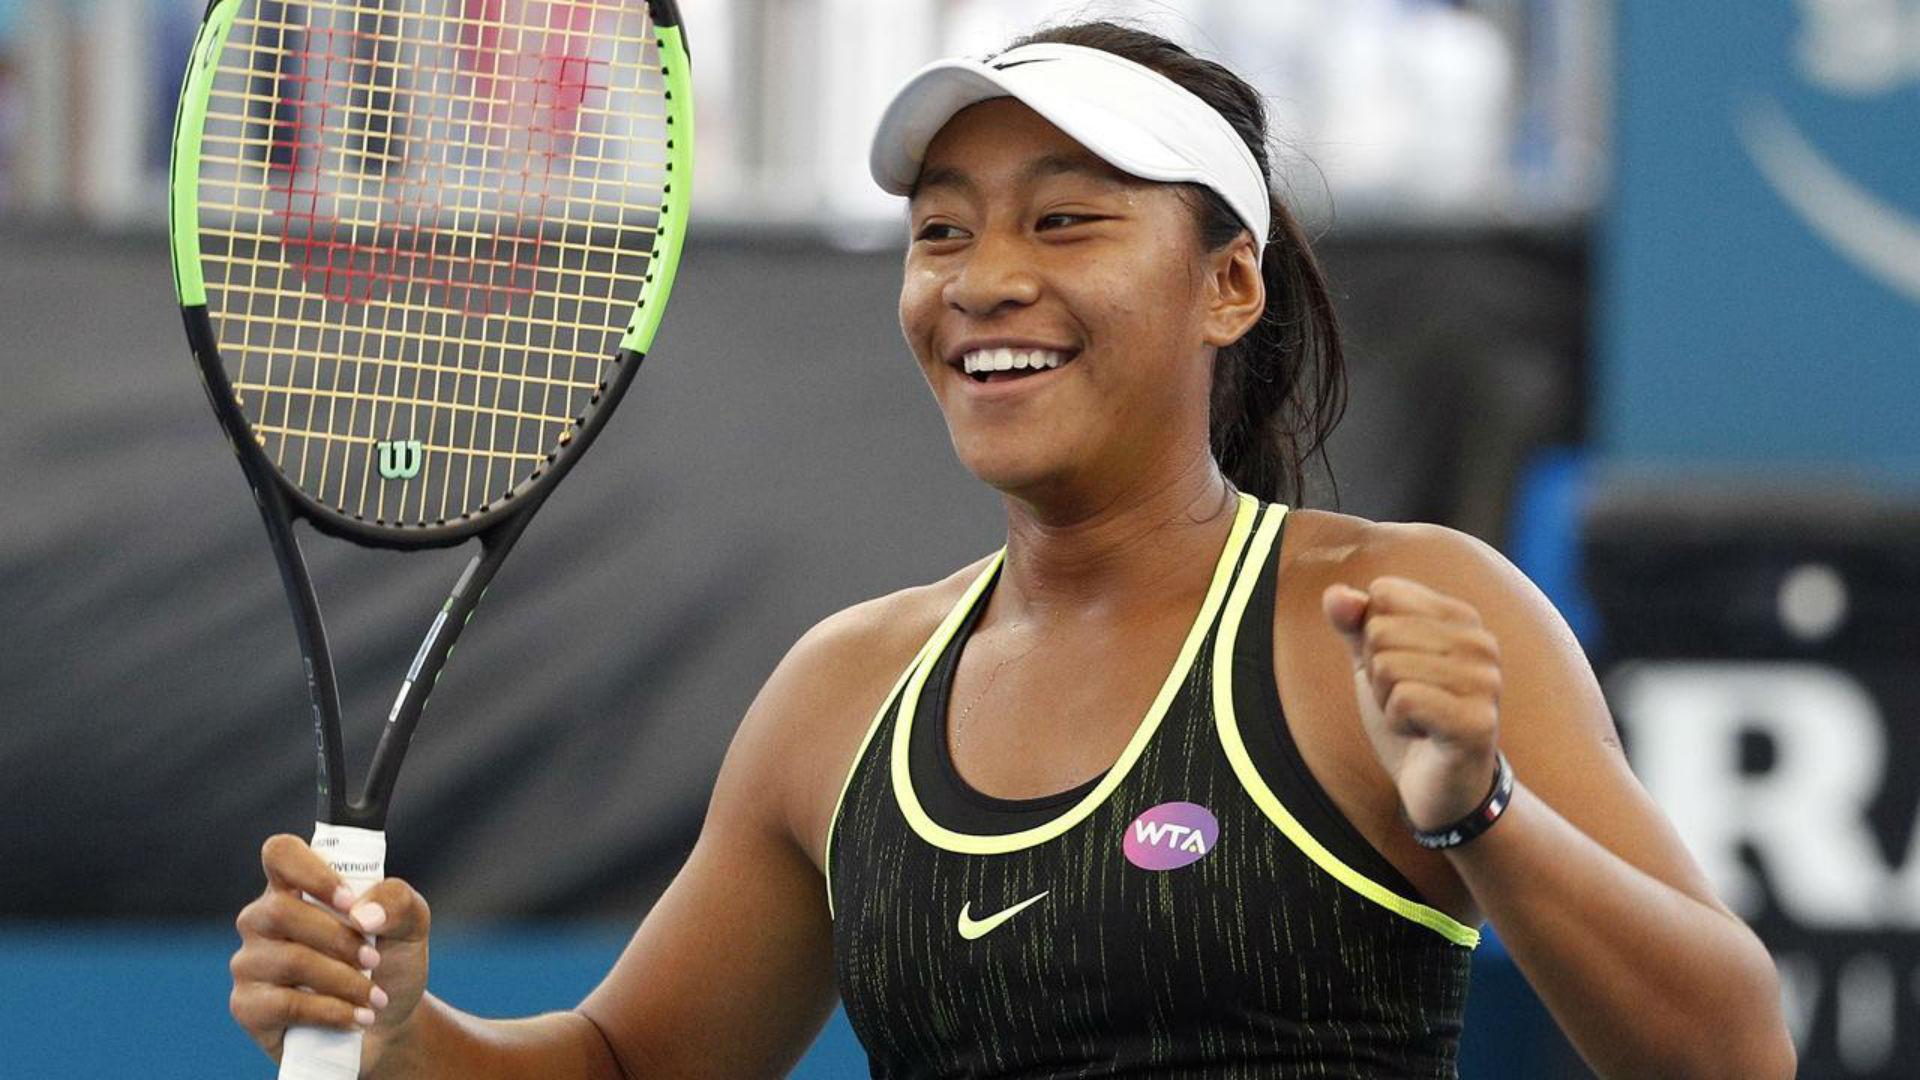 Aiava ready for Aussie tennis spotlight